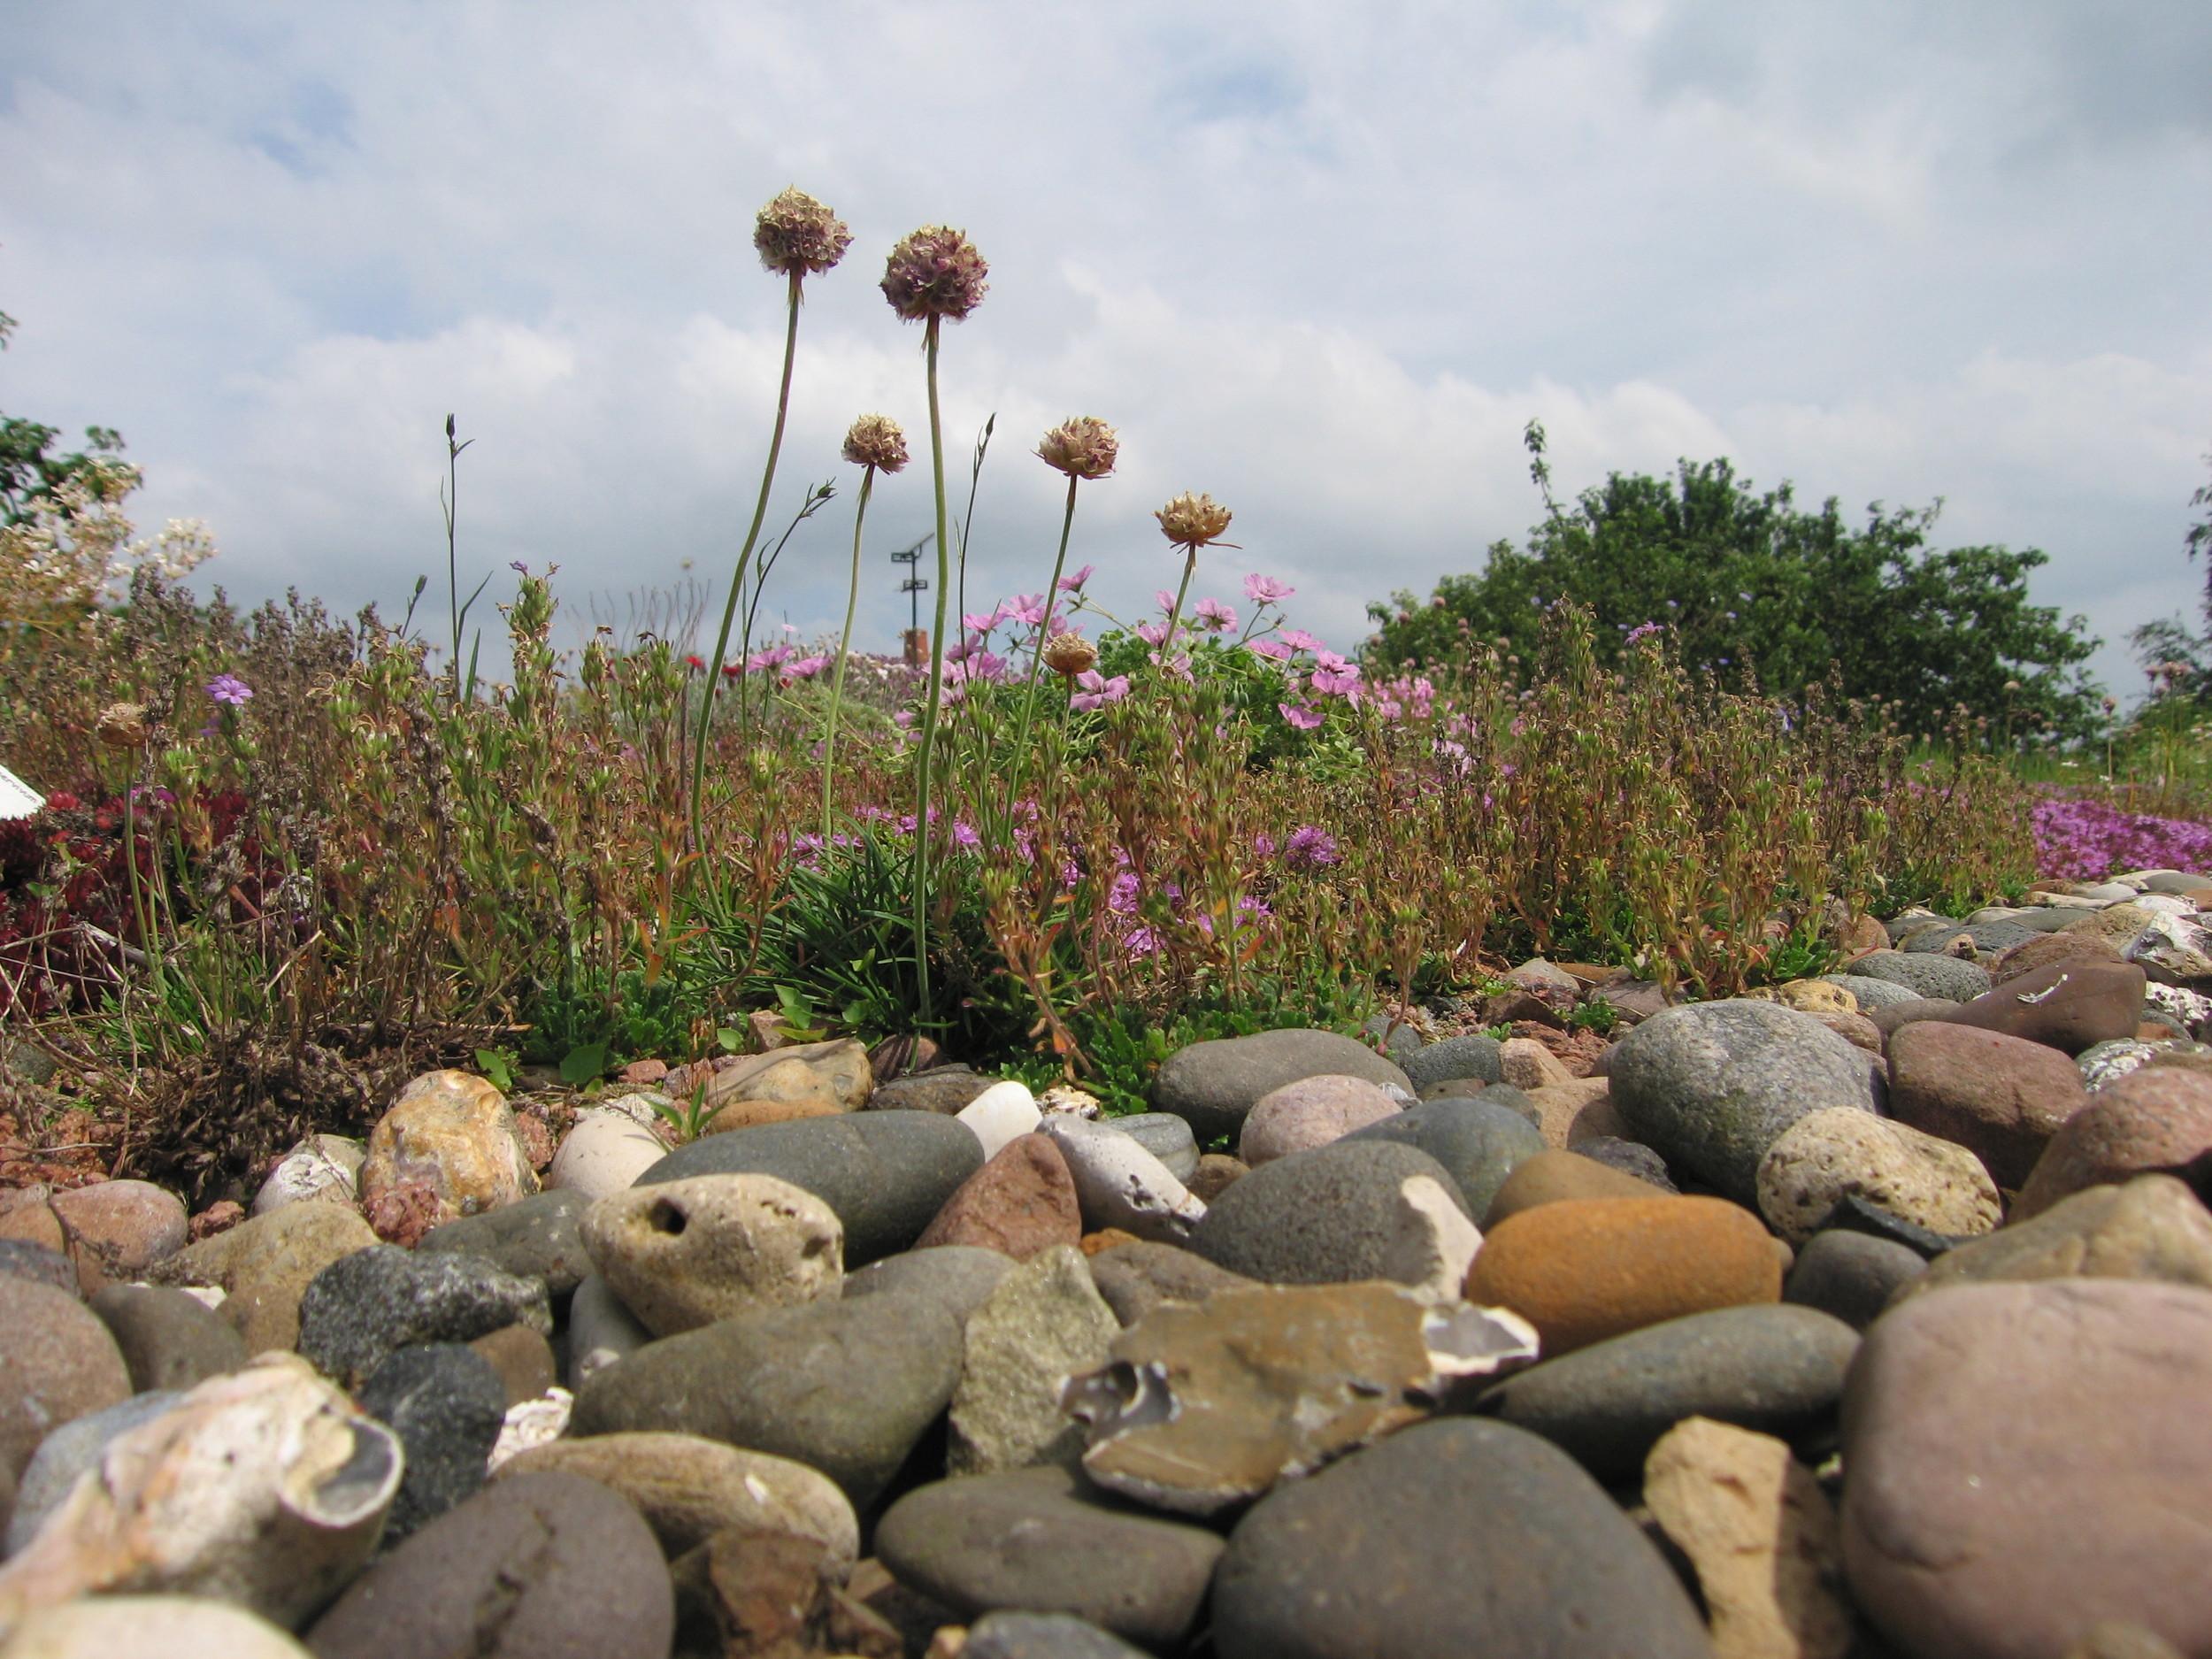 Garden Studio with wild flowers and bio-diversity flourishing on the 'green roof